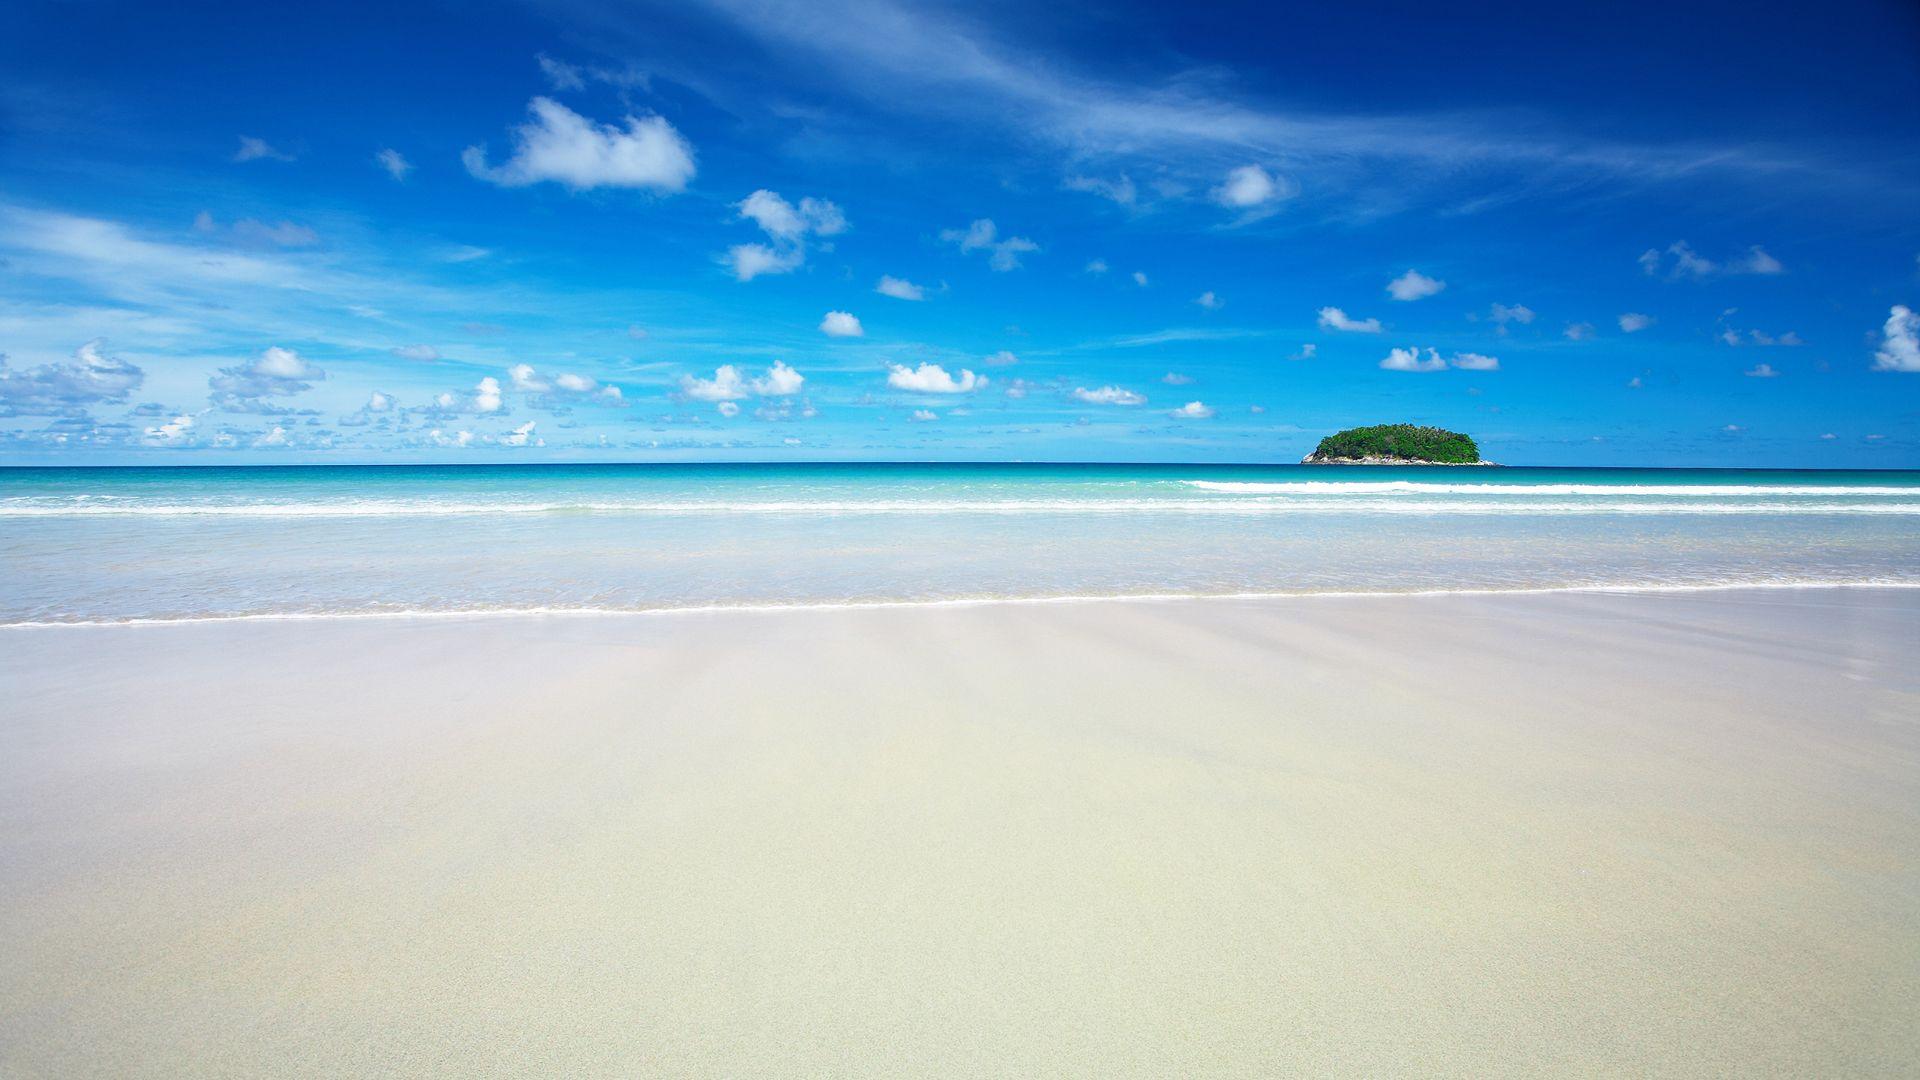 hd_sky_blue_beach-HD